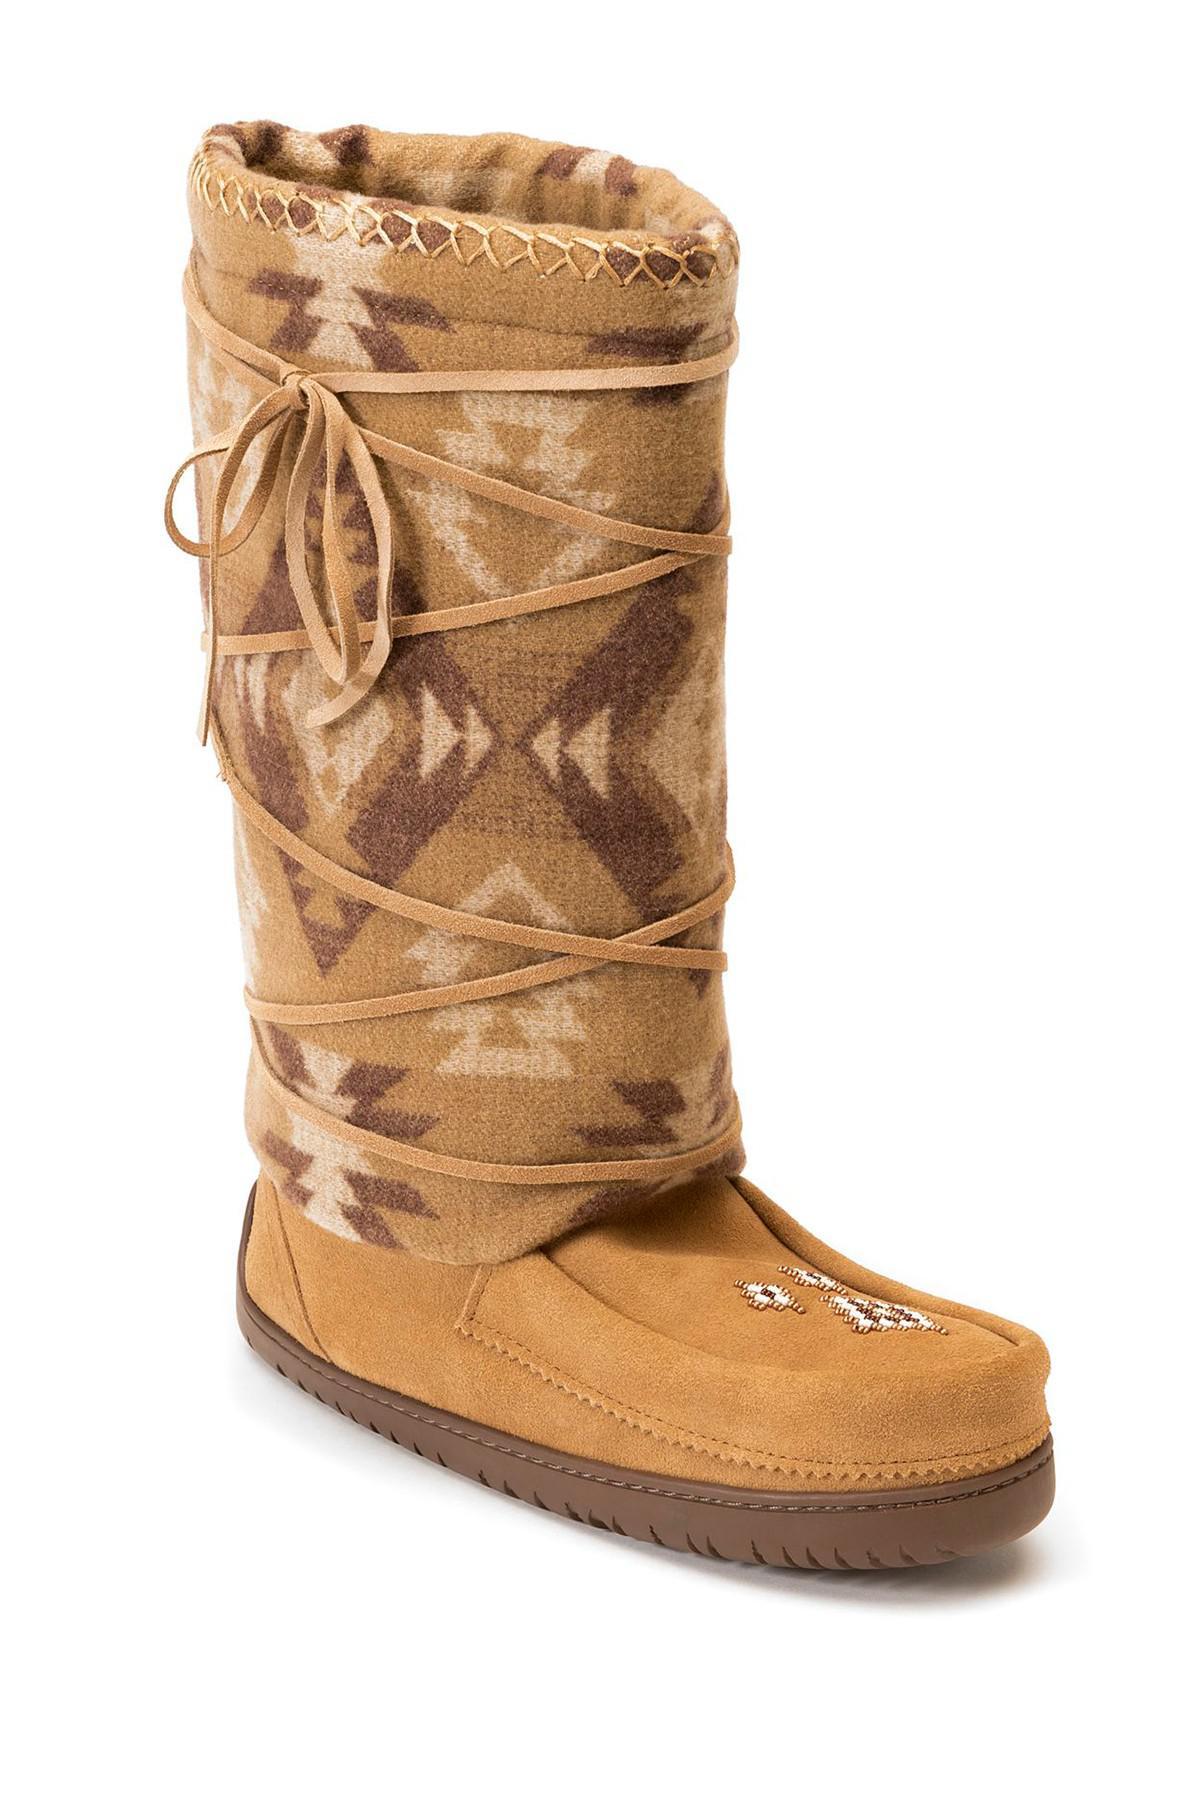 7467e84c90c Lyst - Manitobah Mukluks Wool Lace-up Mukluk in Brown